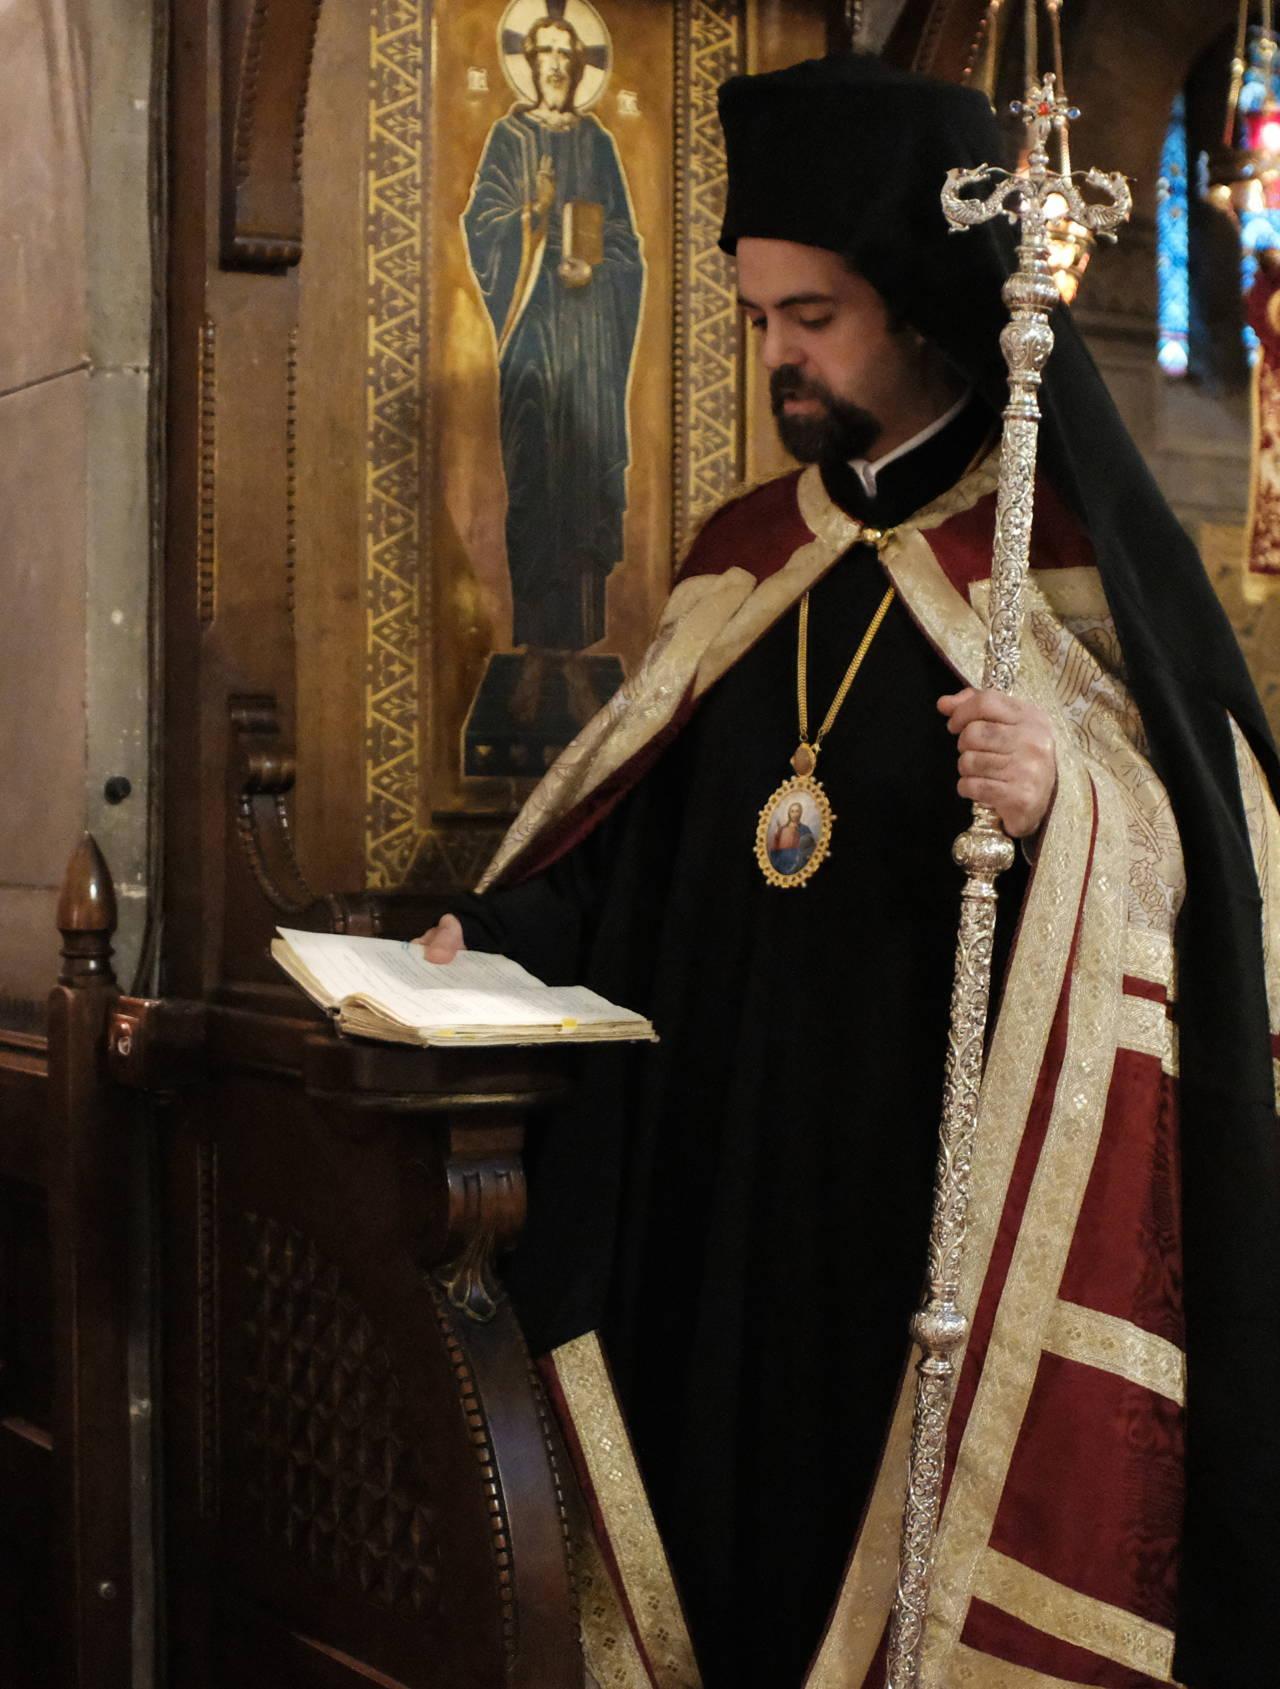 DSCF2785 - Επίσκοπος Μελιτηνής: η θυσιαστική πορεία των Χριστιανών αποτελεί καταξίωση